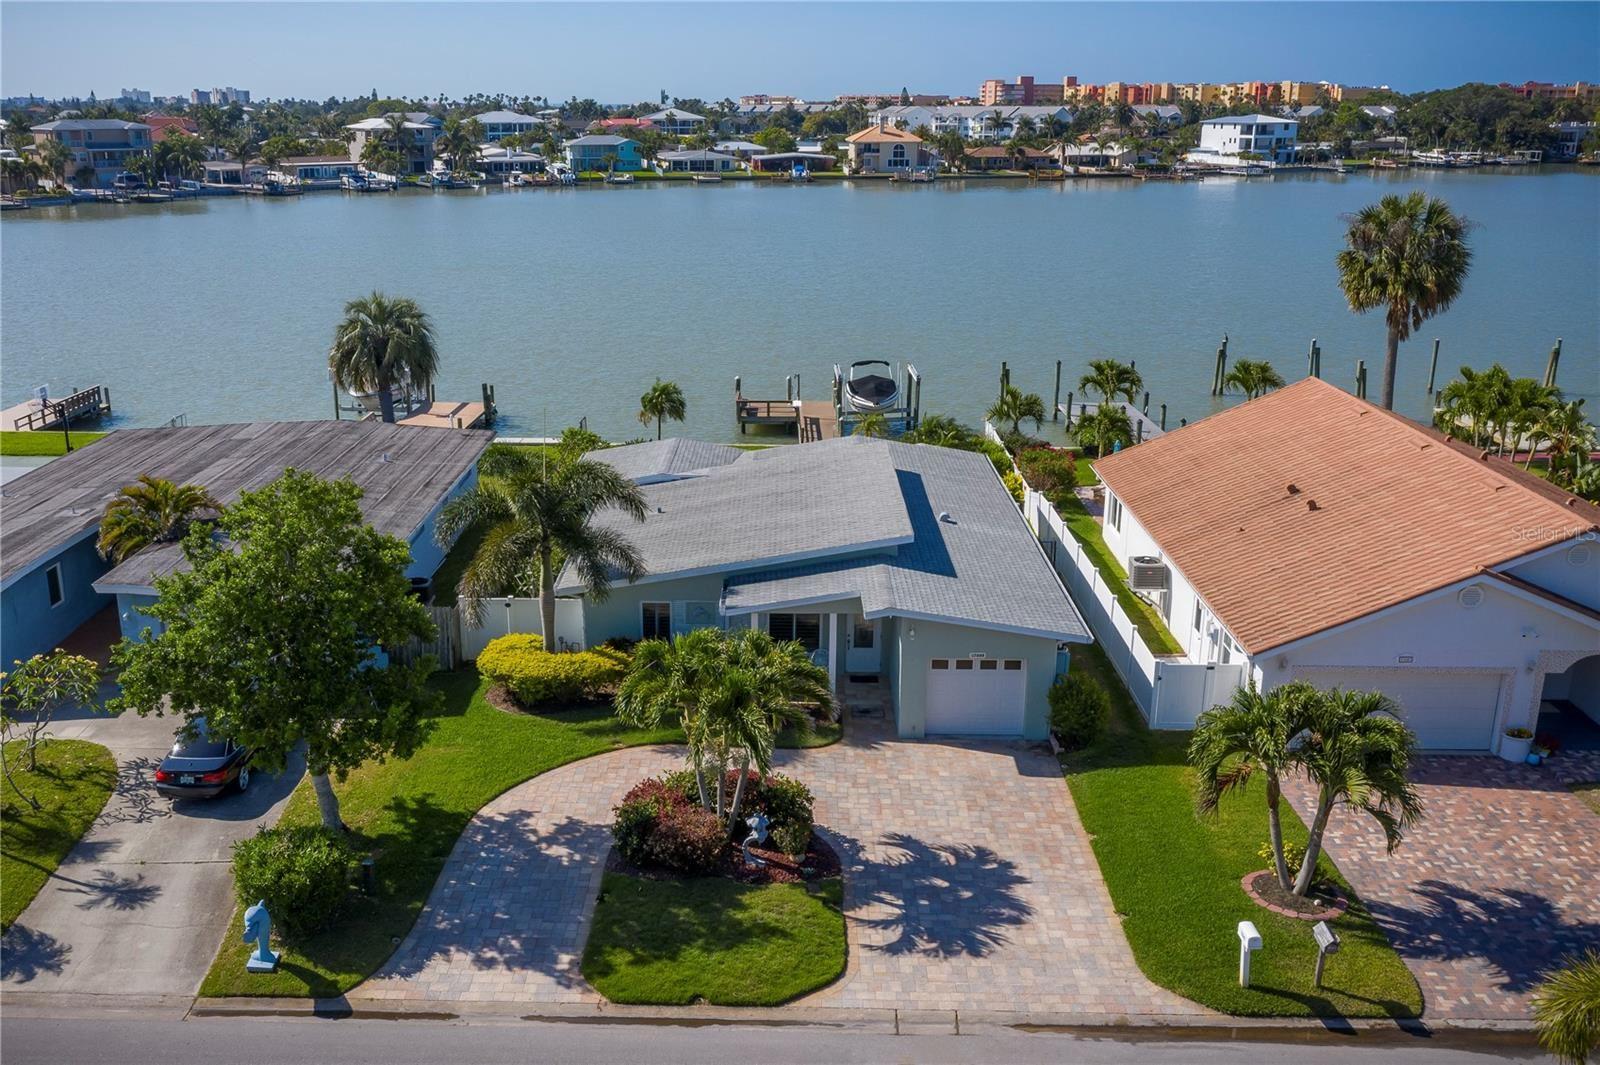 17049 DOLPHIN DRIVE, North Redington Beach, FL 33708 - MLS#: U8131152